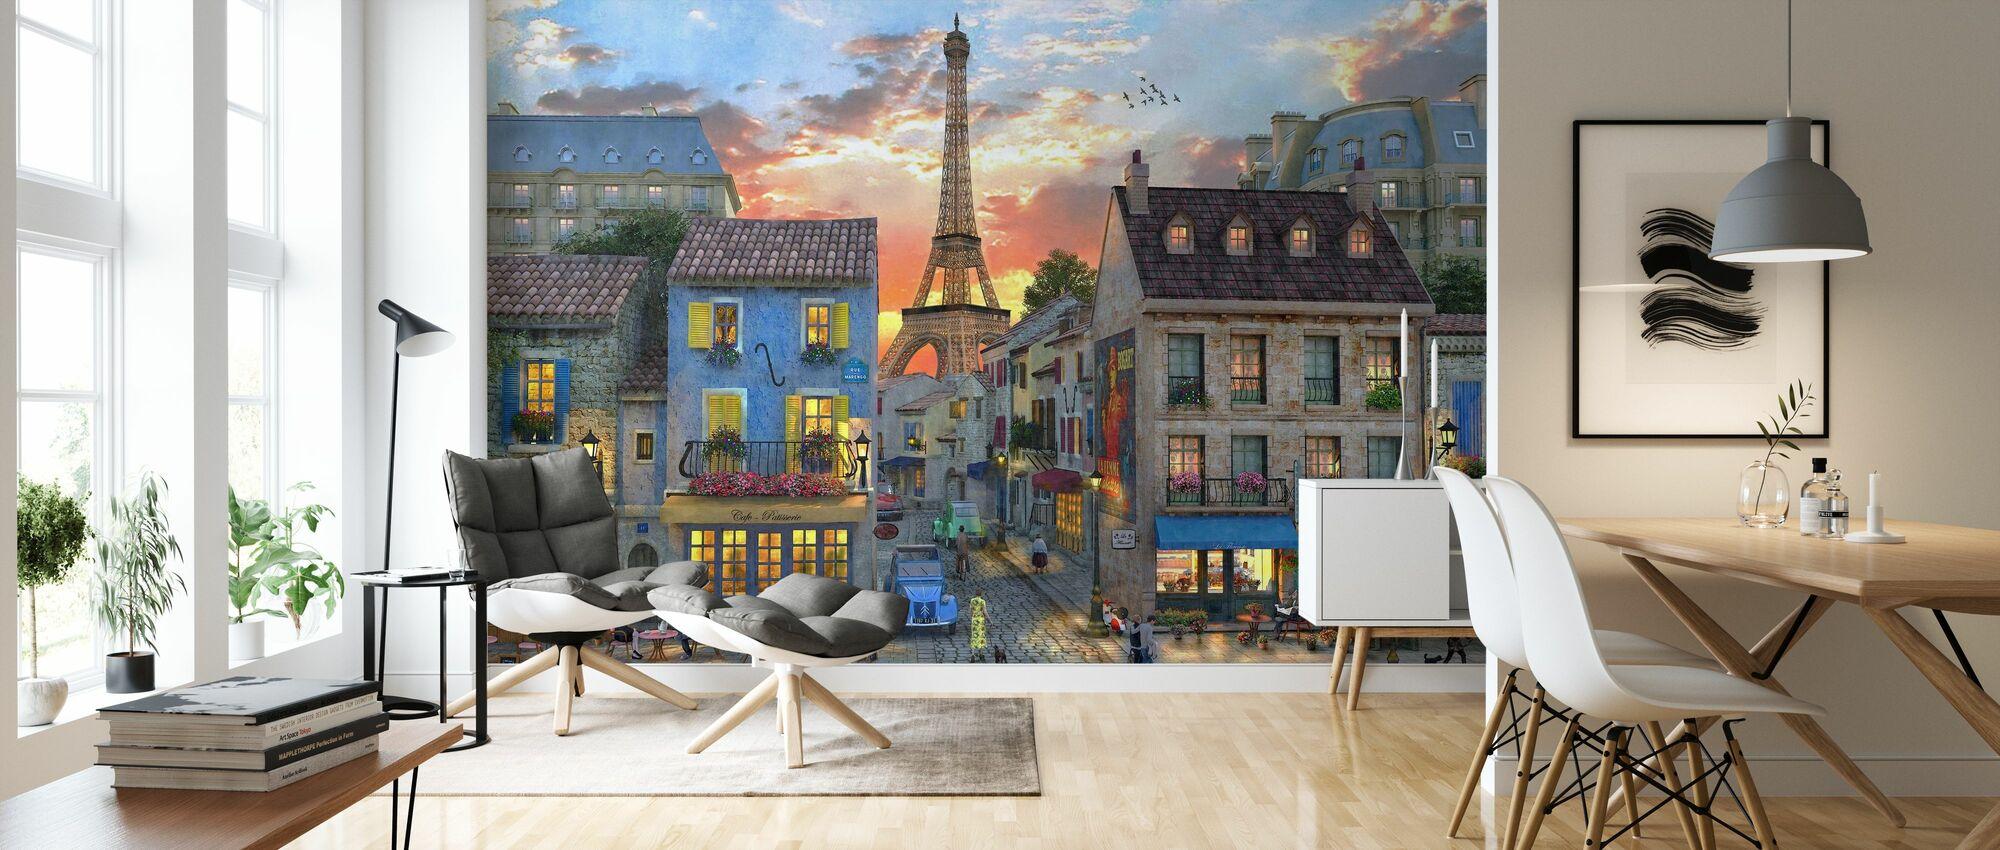 Streets of Paris - Wallpaper - Living Room